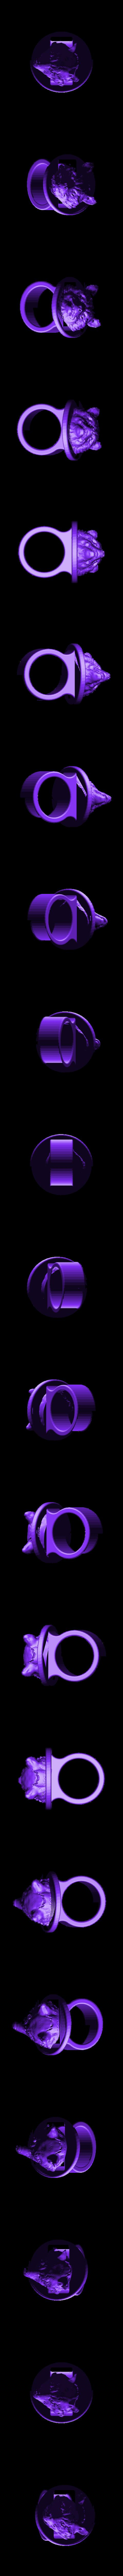 rocket_ring.stl Download free STL file Rocket Raccoon ring for Eliza • 3D printable template, Opossums